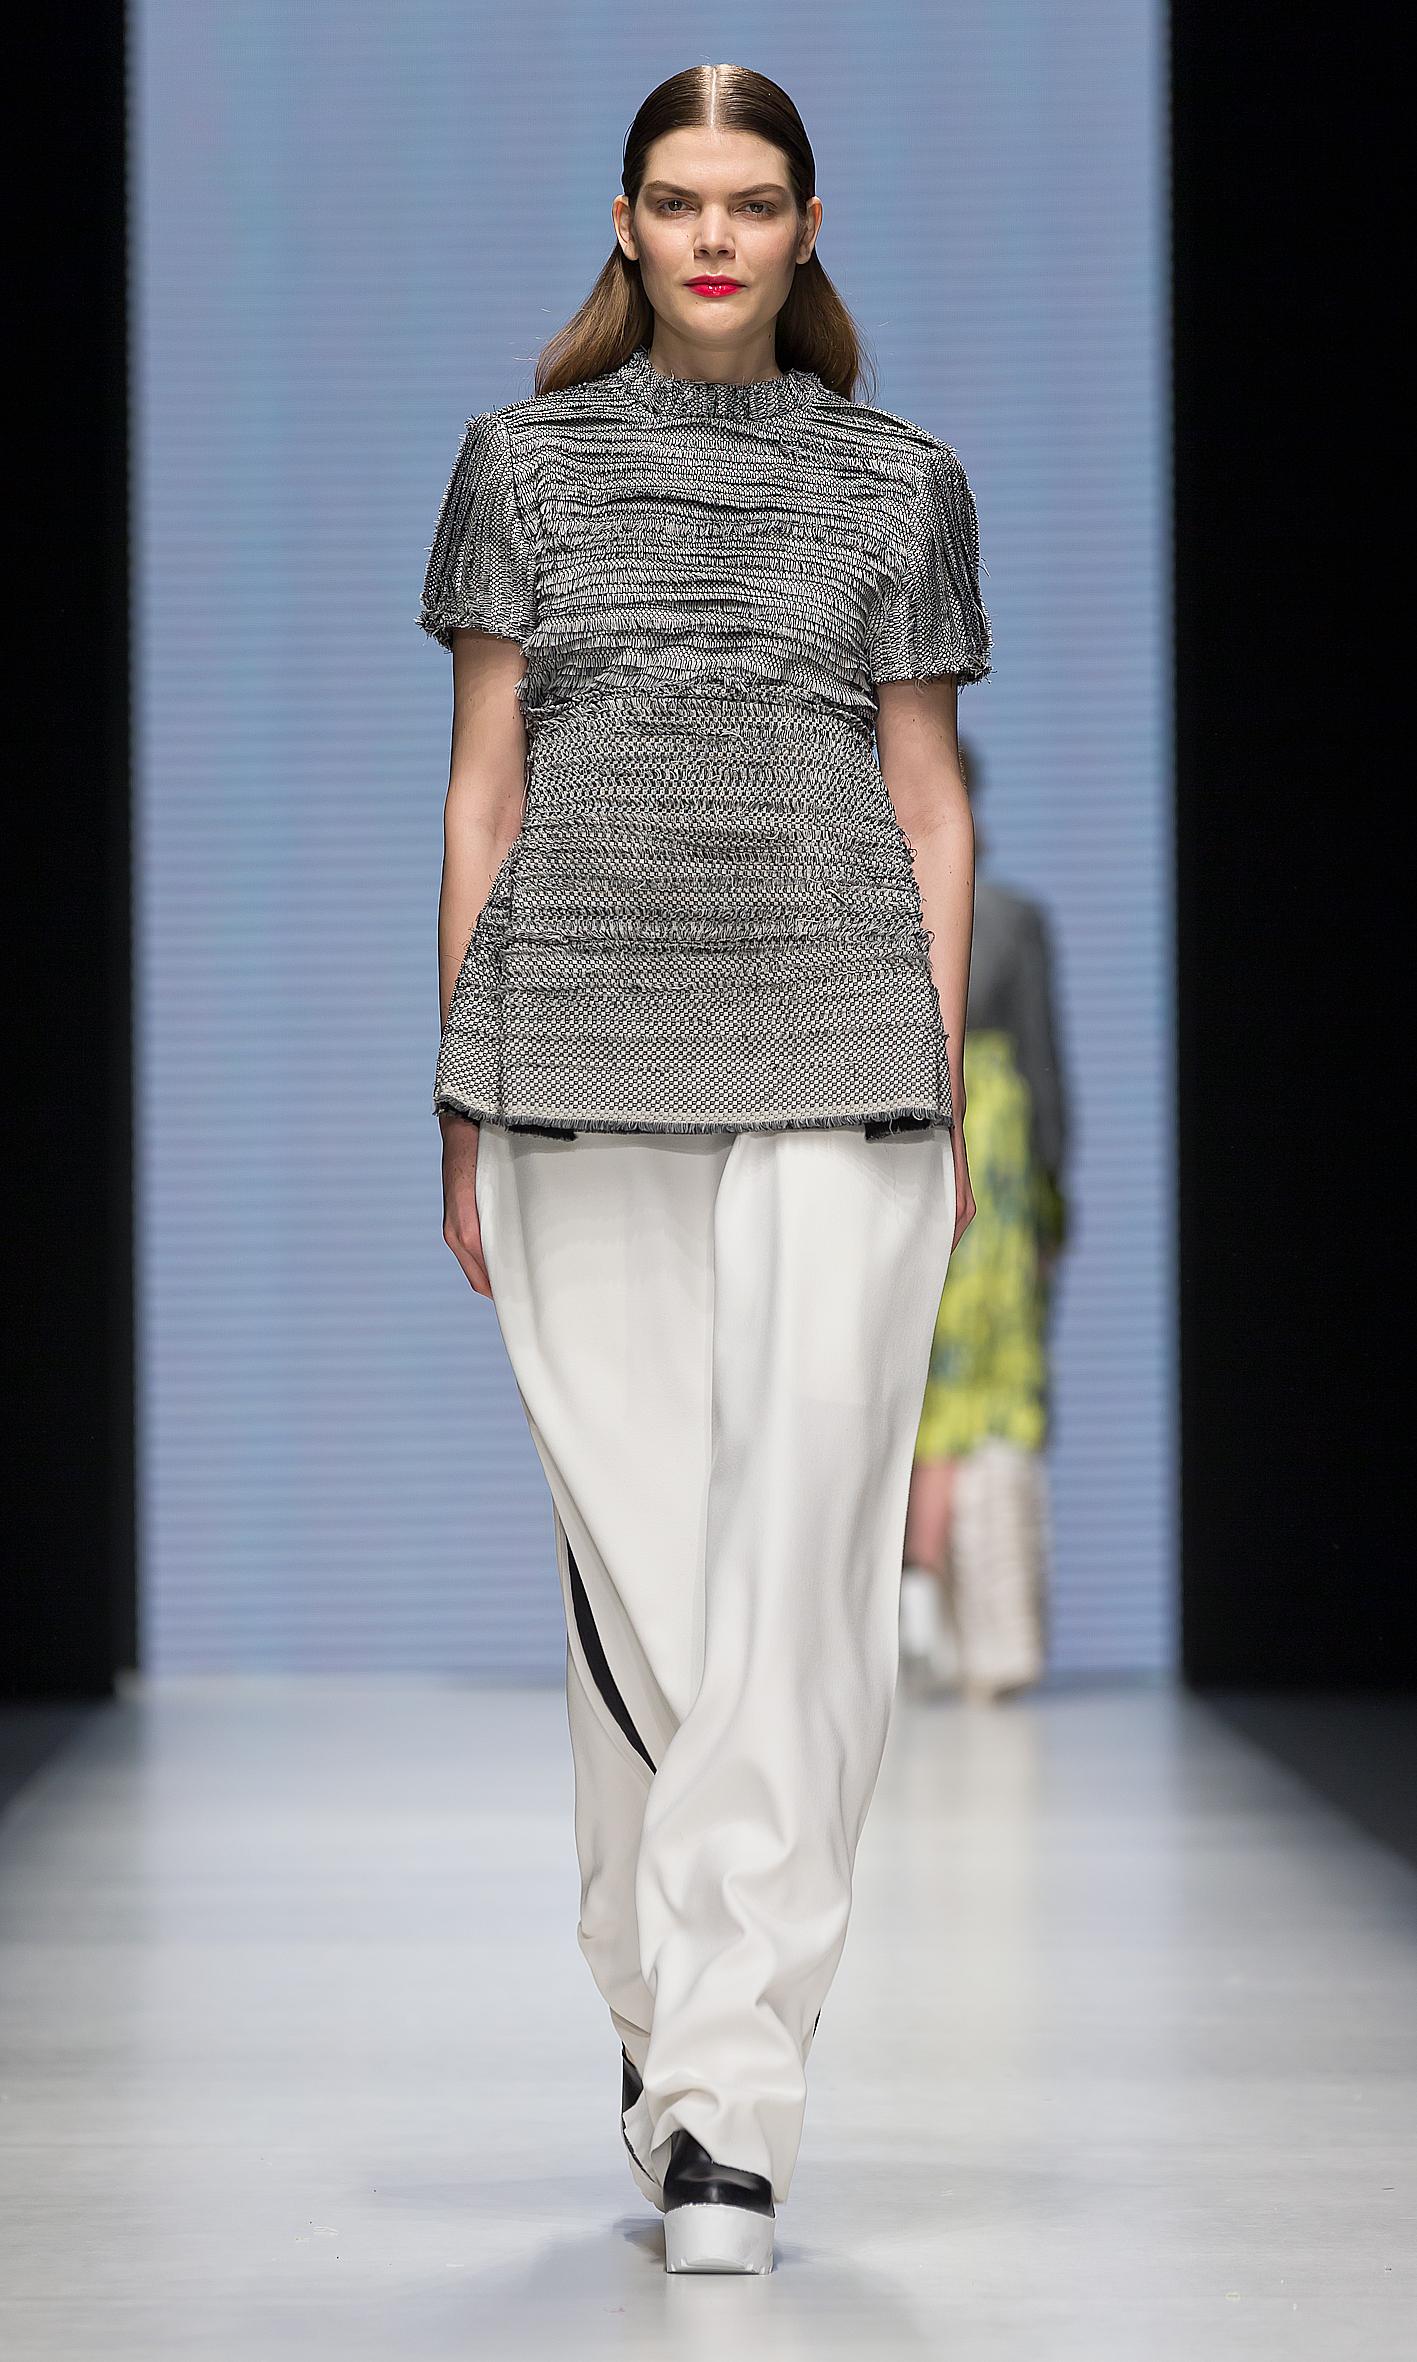 H&M Design Award 2014 Eddy Anemian 3